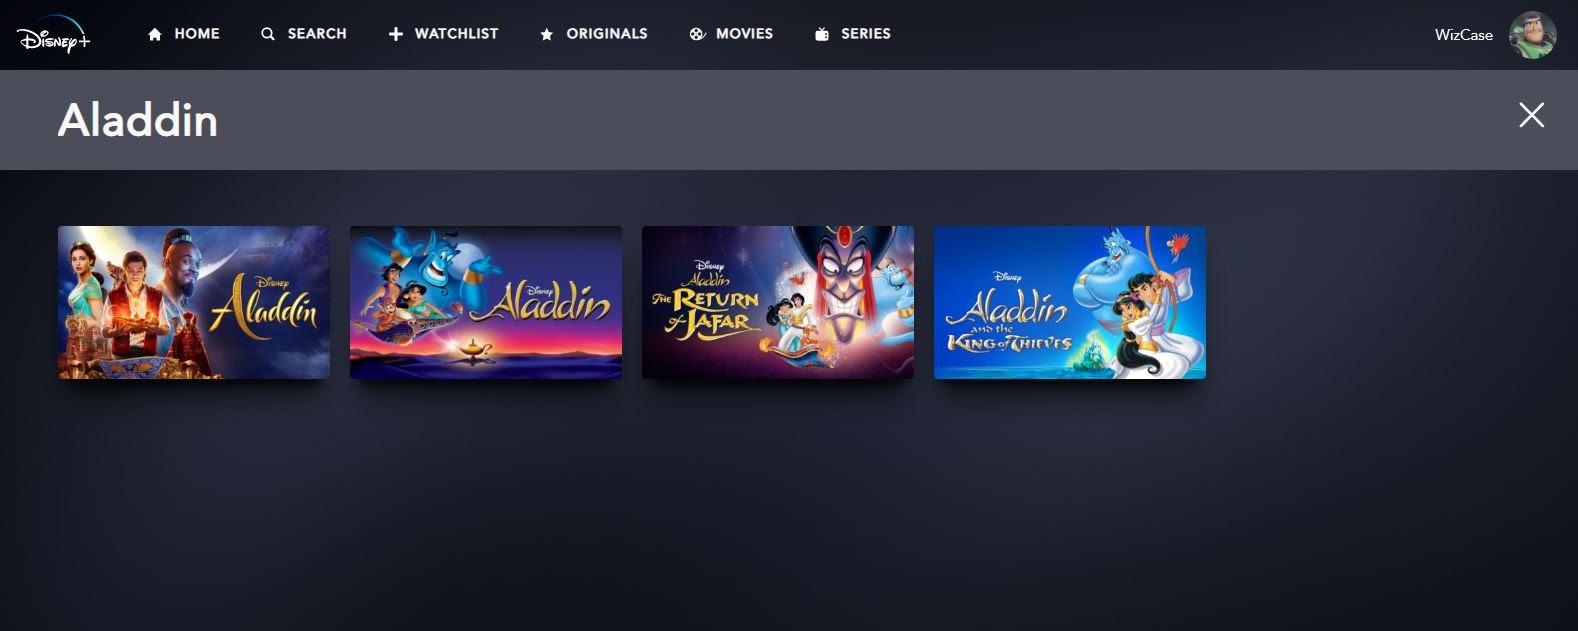 Screenshot of 4 Aladdin movies on Disney Plus streaming service